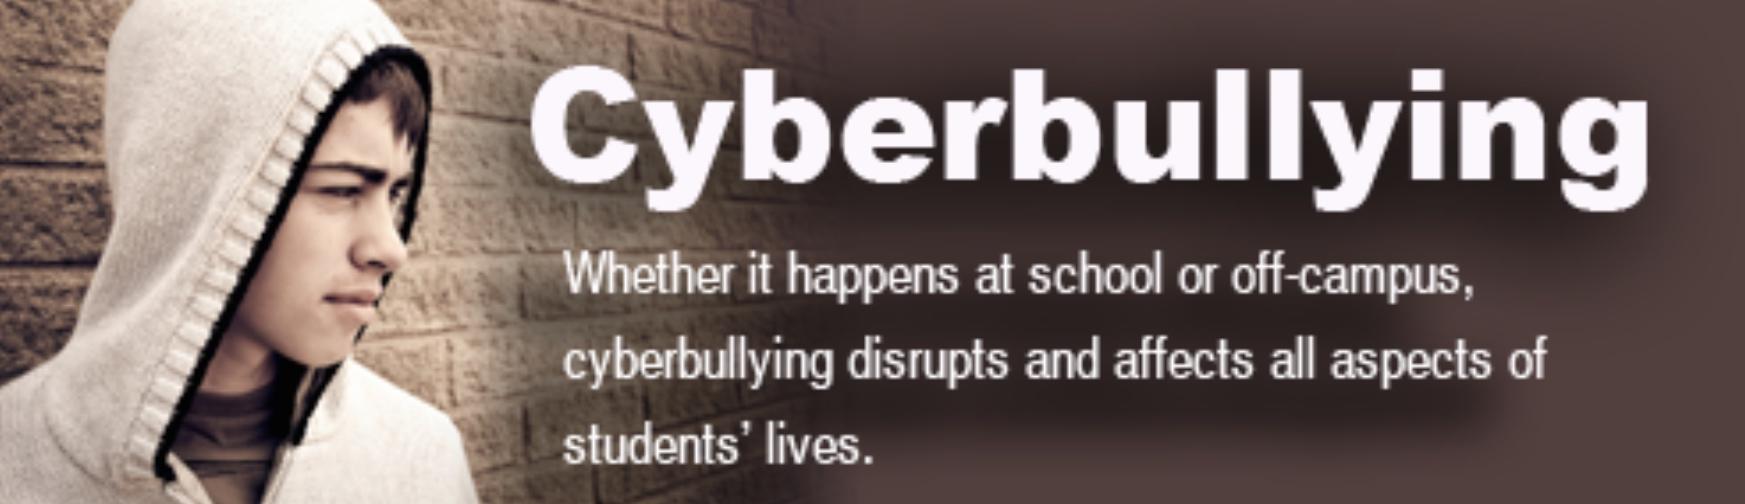 informed features strategies educators stop cyberbullying